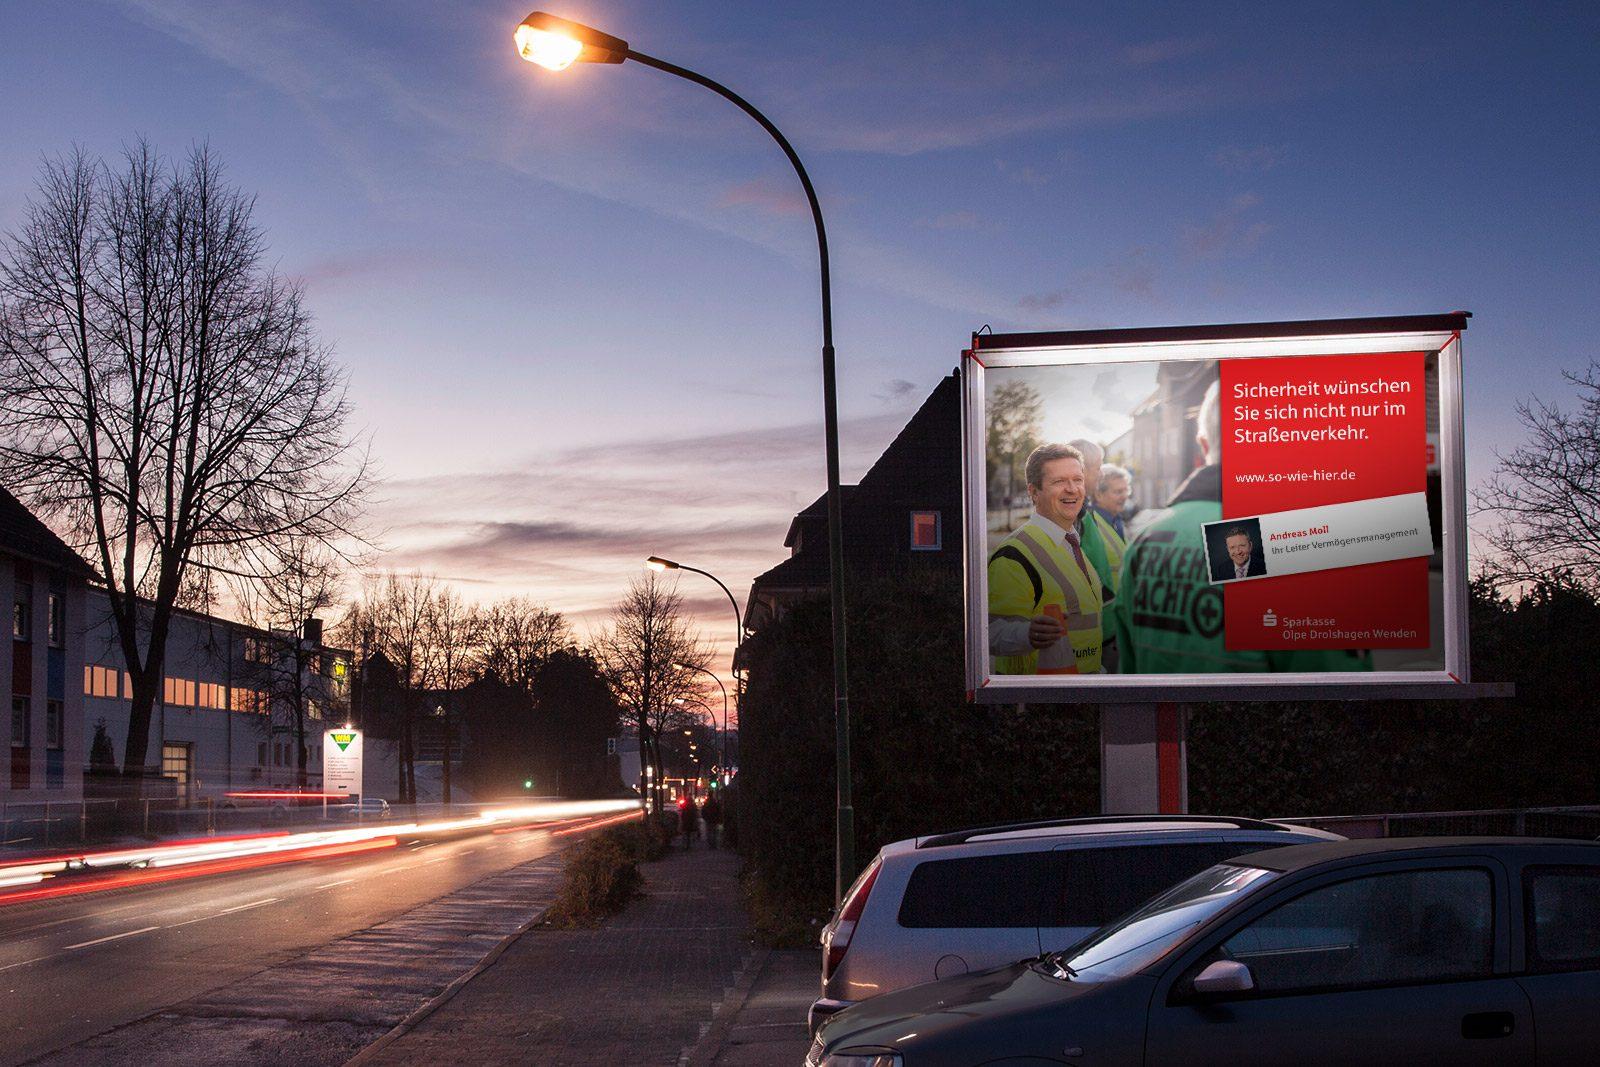 kampagne-sparkasse-olpe-drolshagen-wenden-181-01